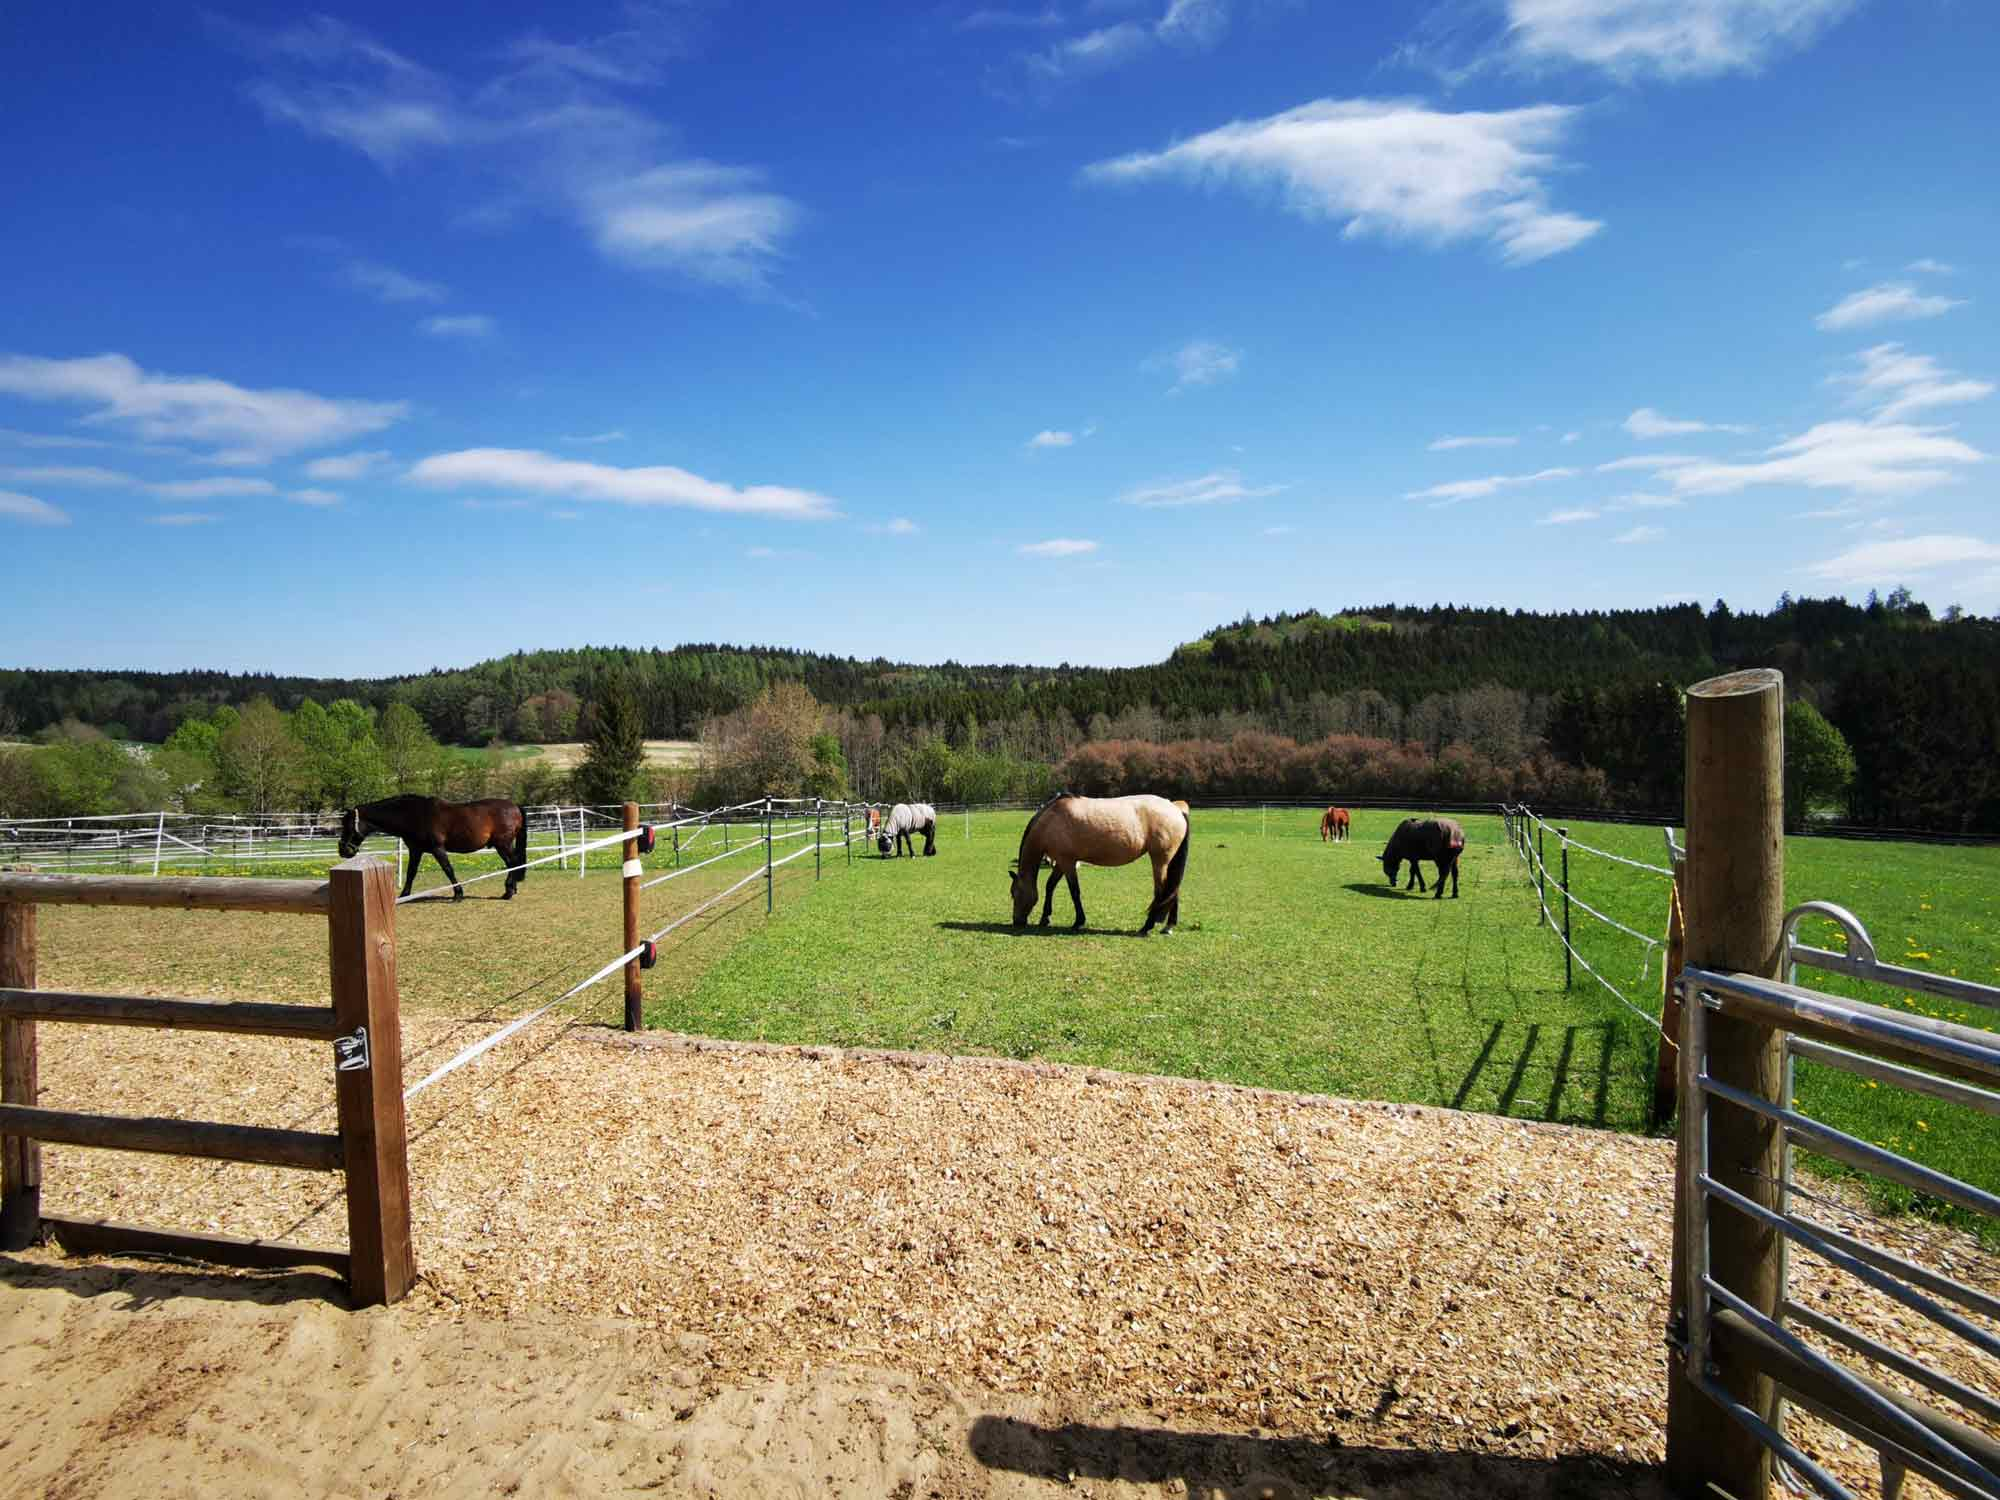 Pferdekoppel & Farmleben auf der Kulturfarm